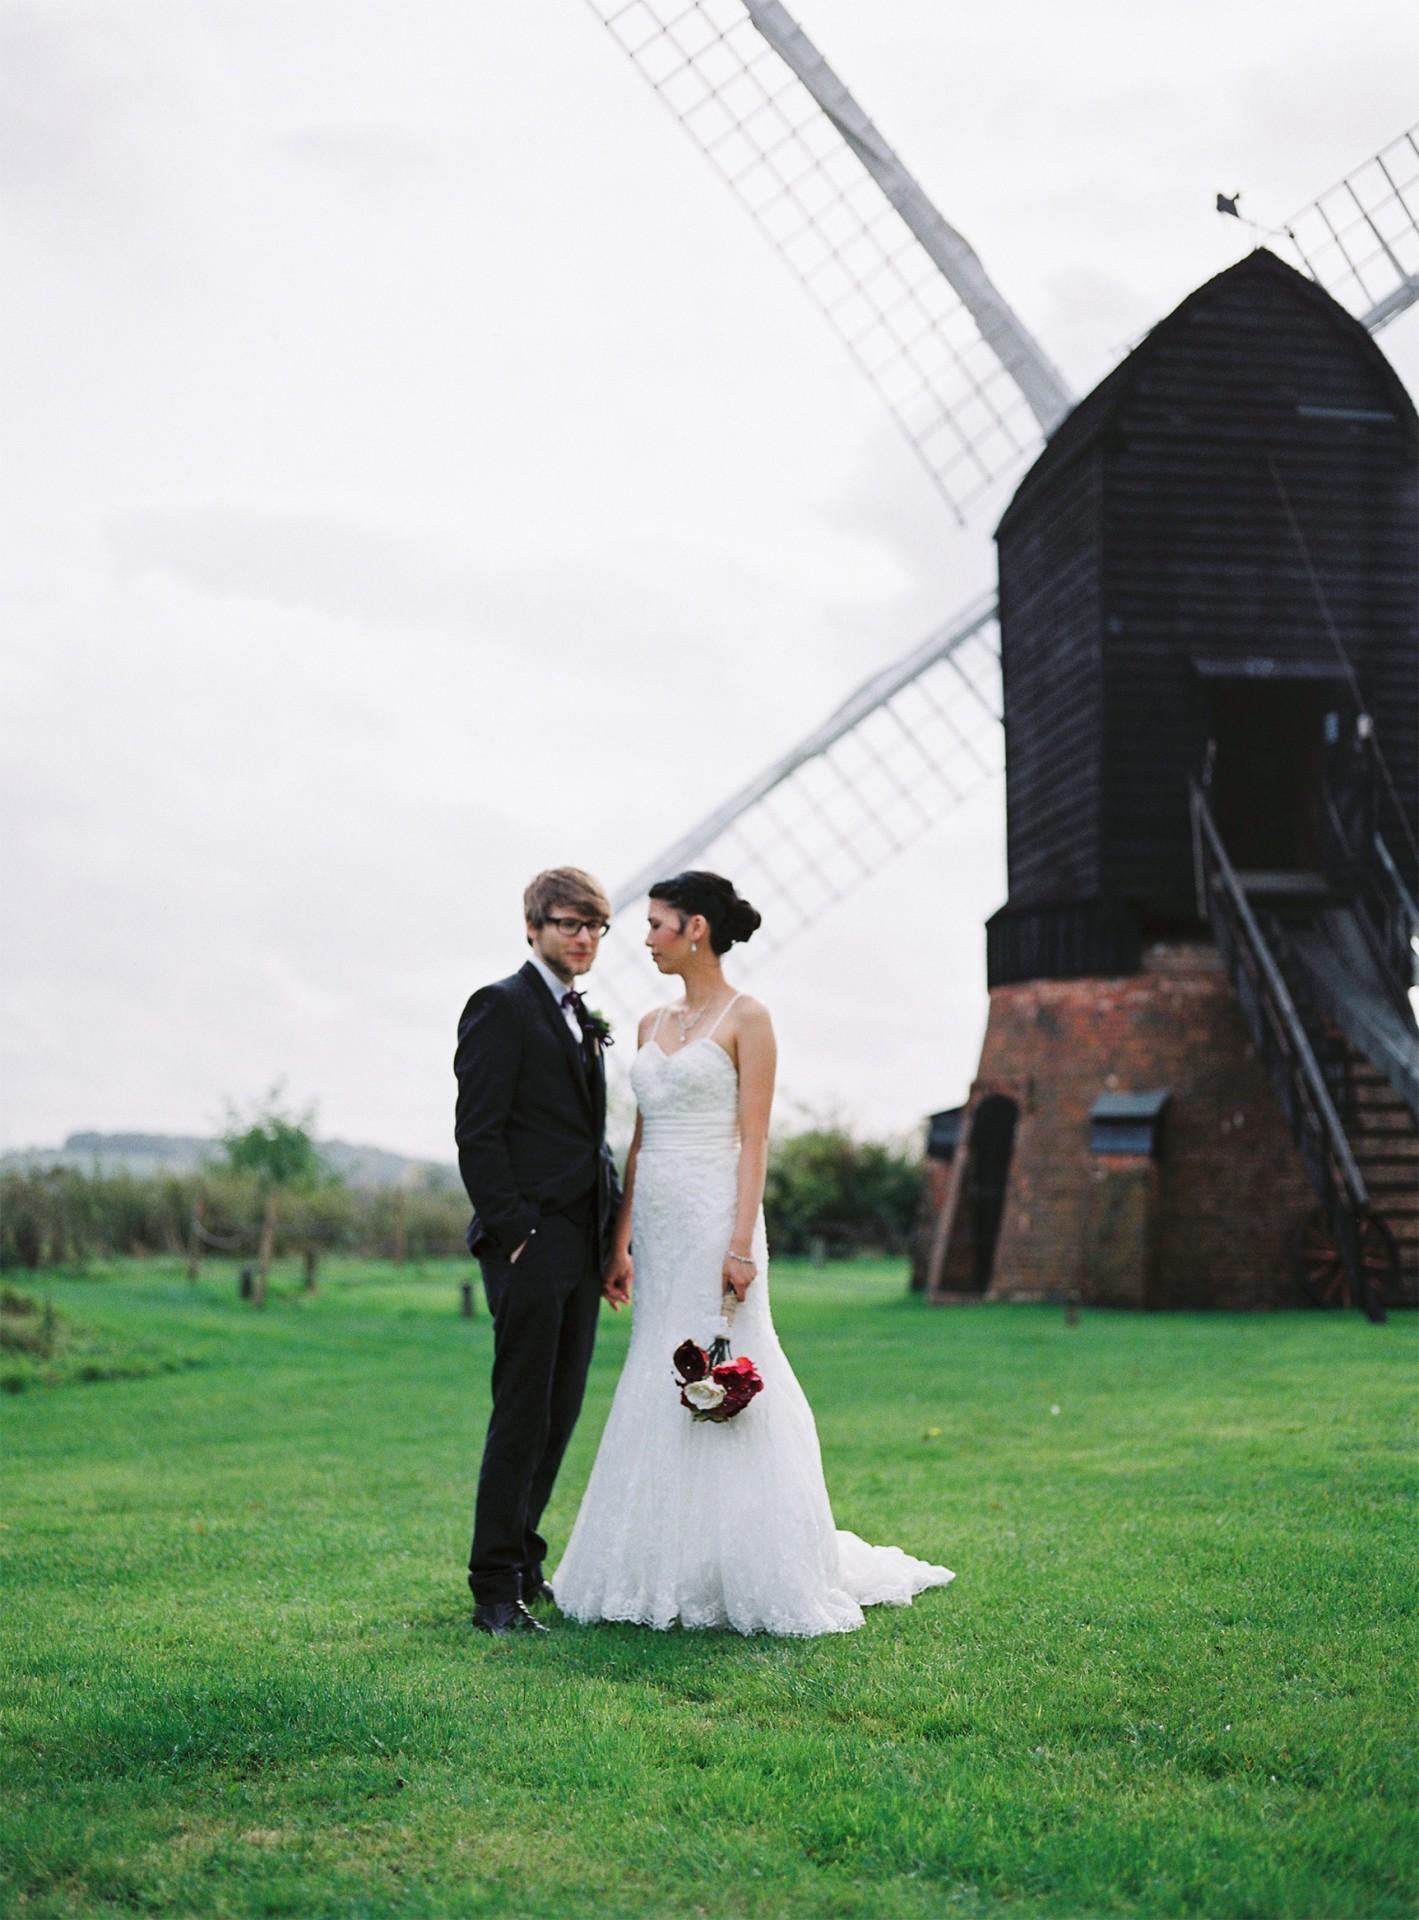 Chloe_Matt_Chinese-Rustic-Wedding_SBS_012